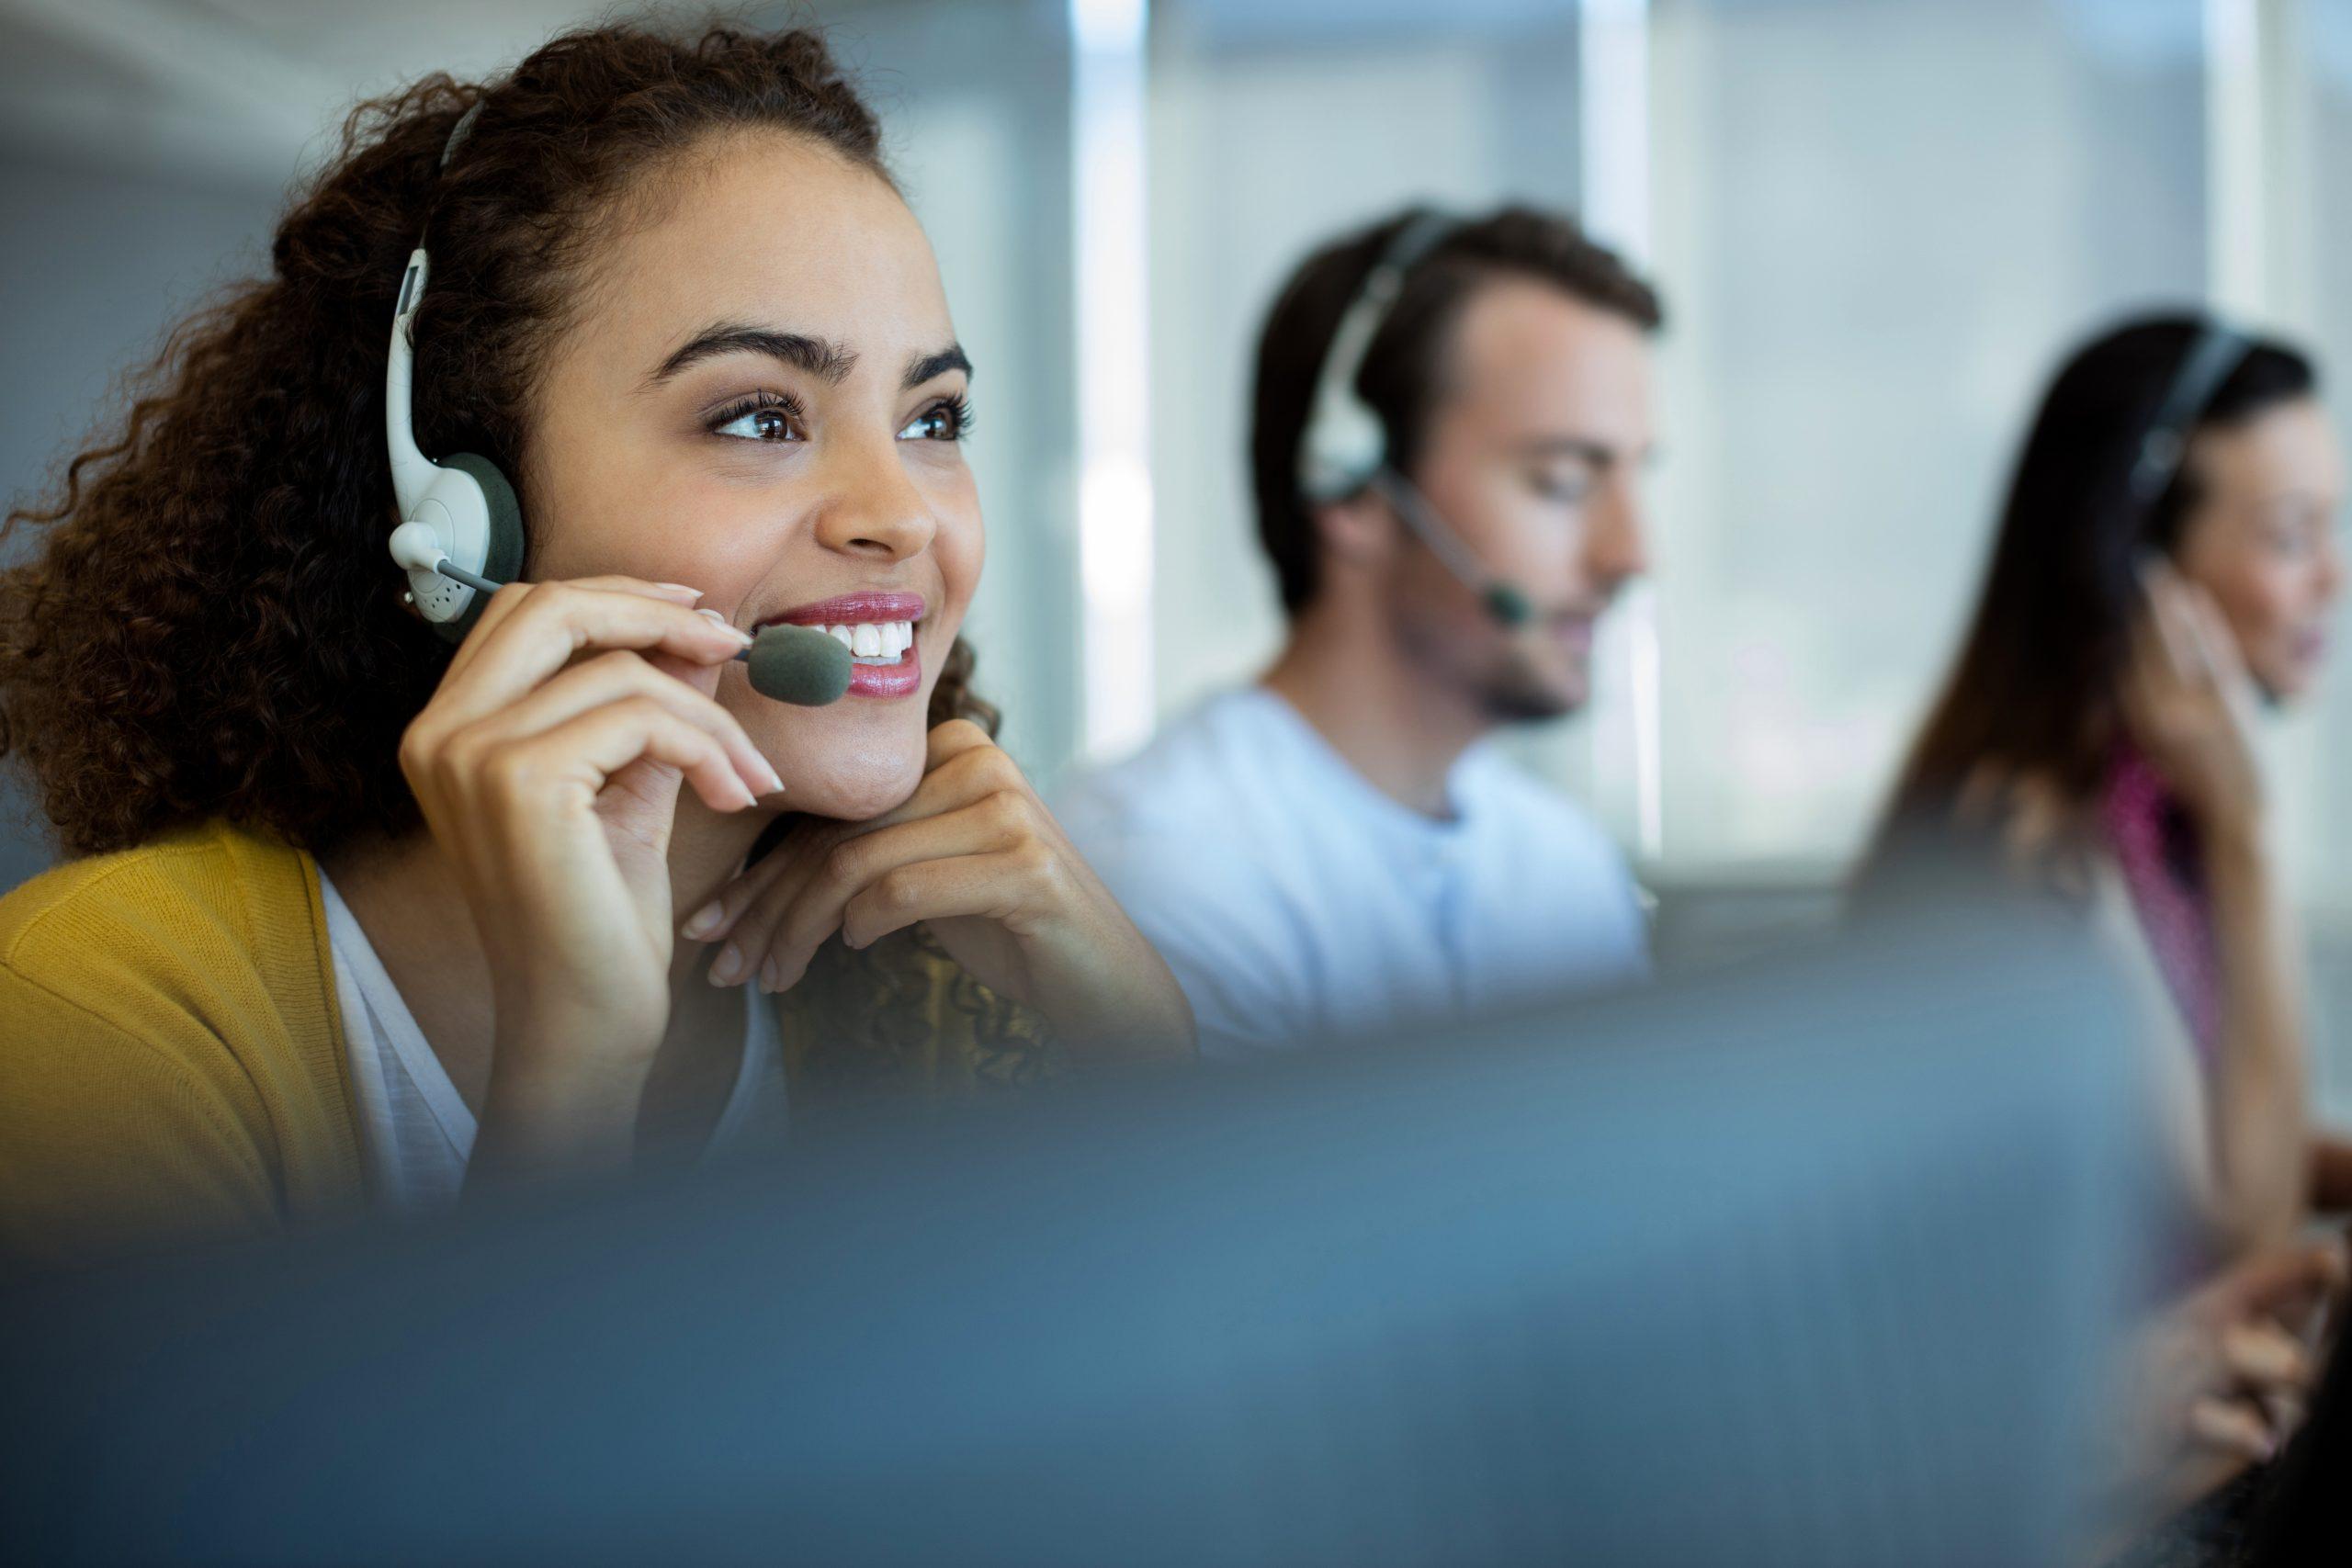 Multi-ethnic customer service executive working